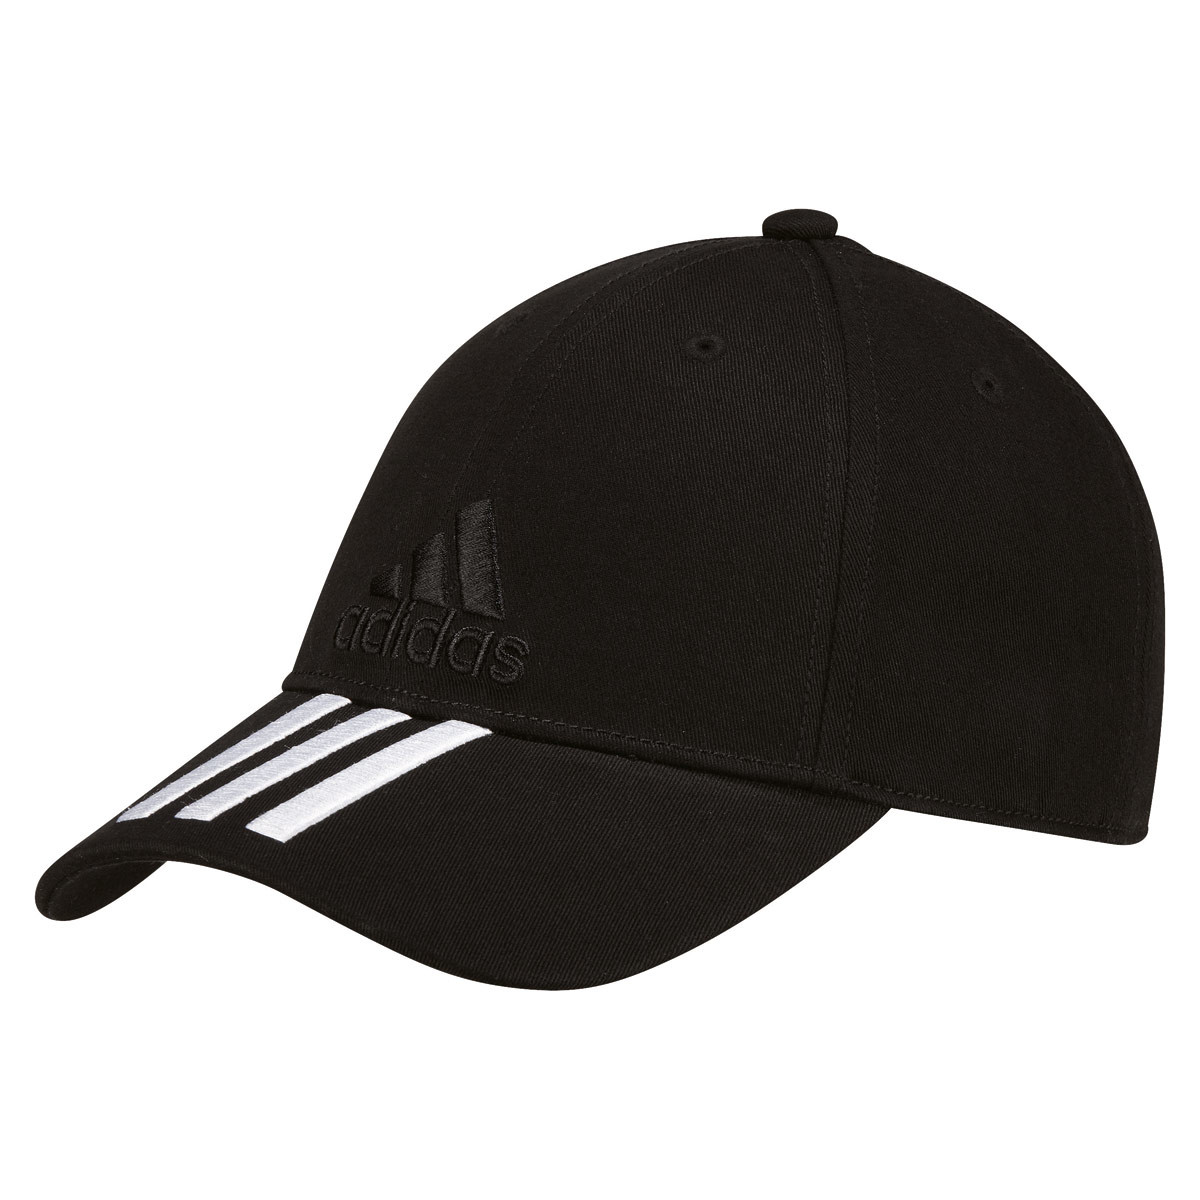 adidas 6 Panel Classic Cap 3 Stripes Cotton - Headdress - Black  78b2dc97e1b4